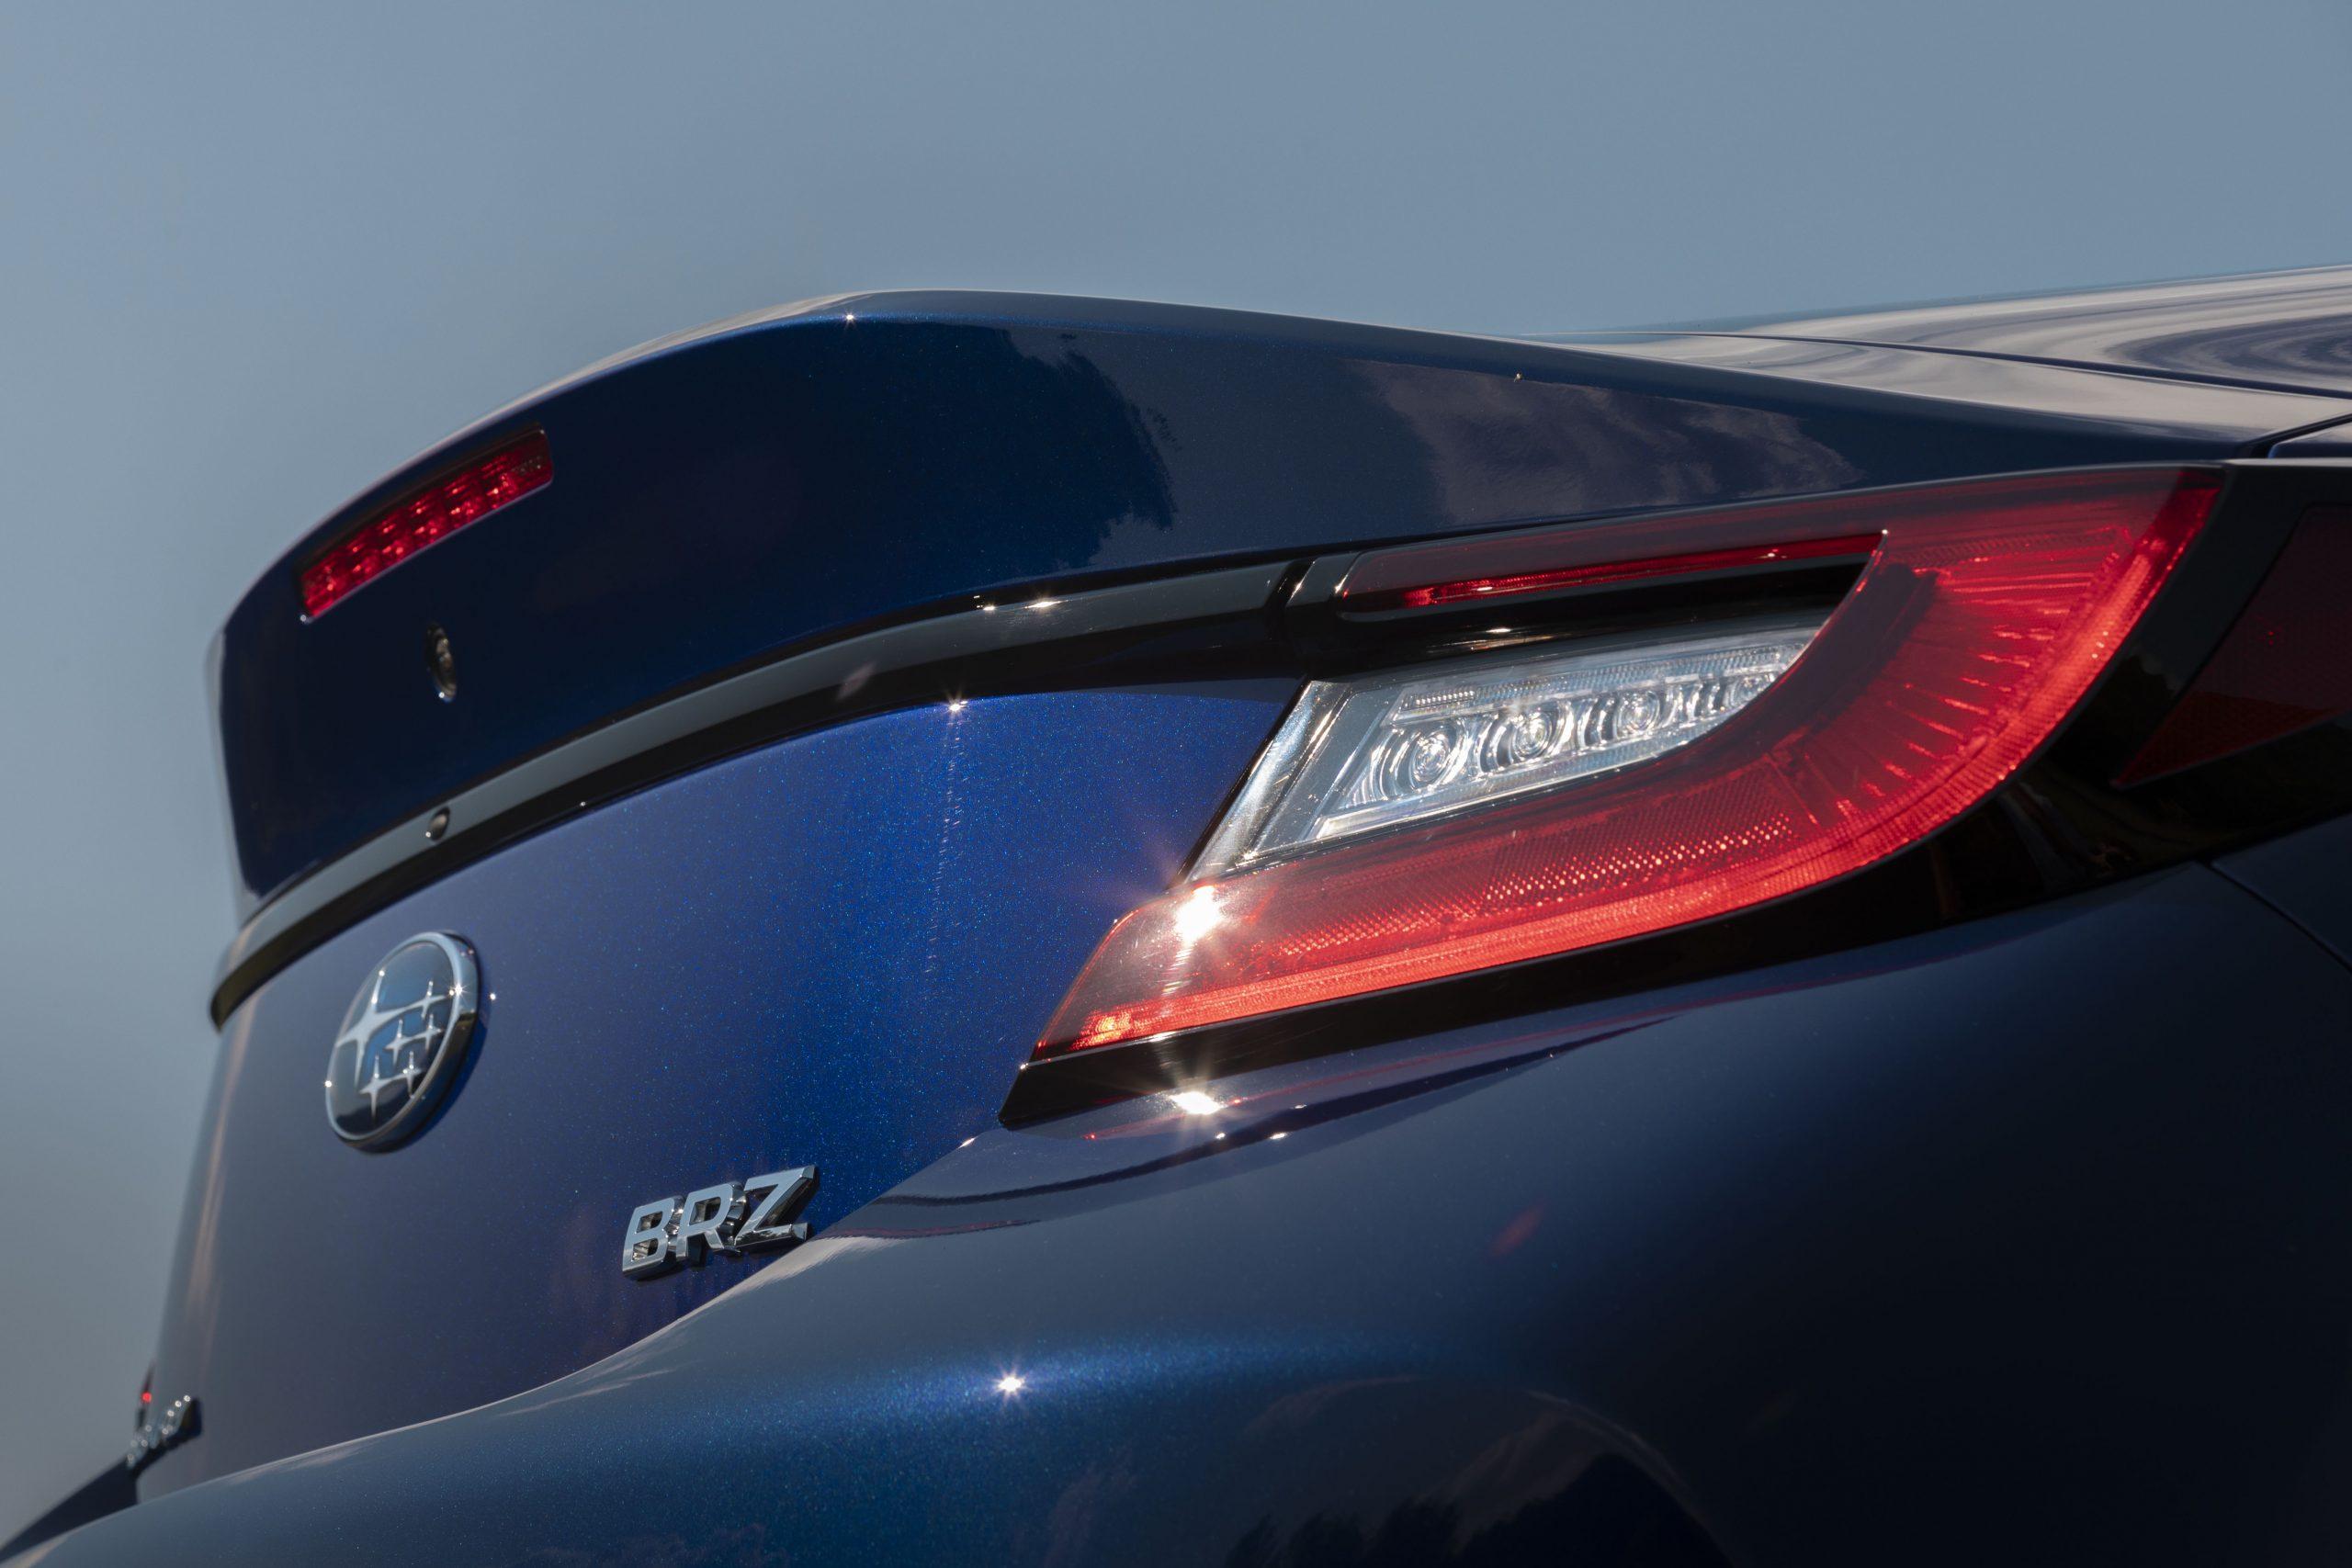 2022 Subaru BRZ rear shape detail